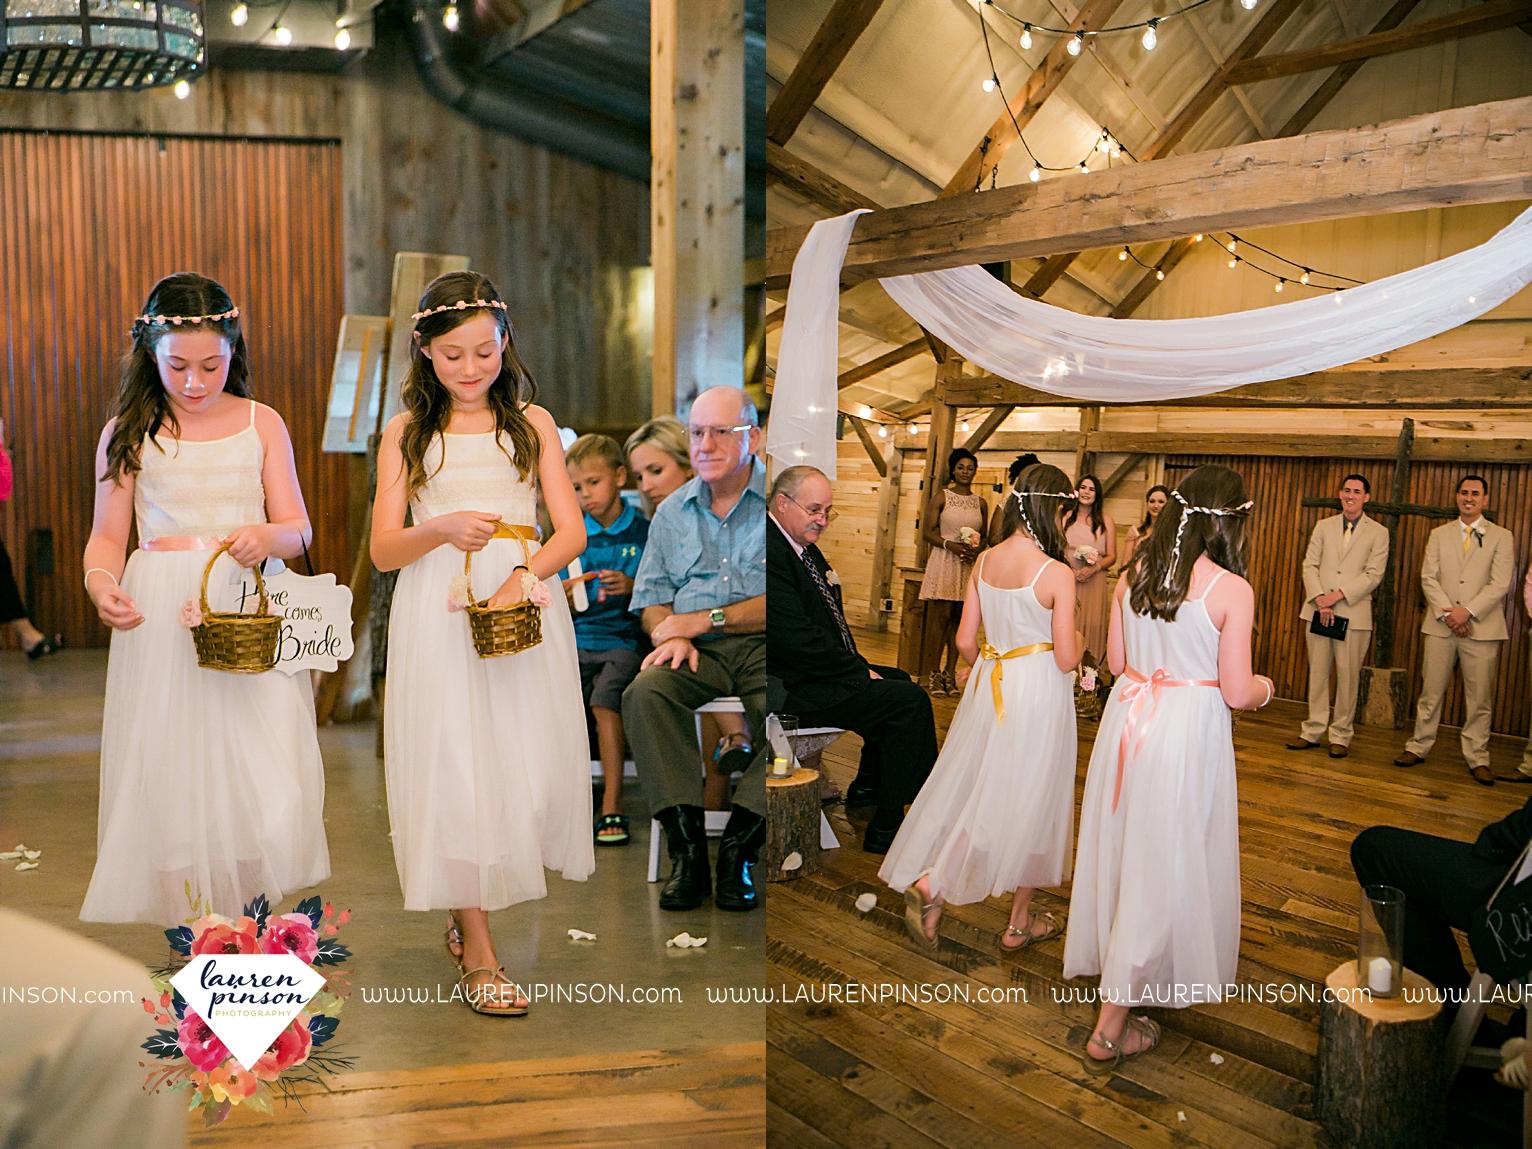 weatherford-texas-hollow-hill-farm-event-wedding-mineral-wells-dfw-wedding-photographer-wichita-falls-photography_3157.jpg